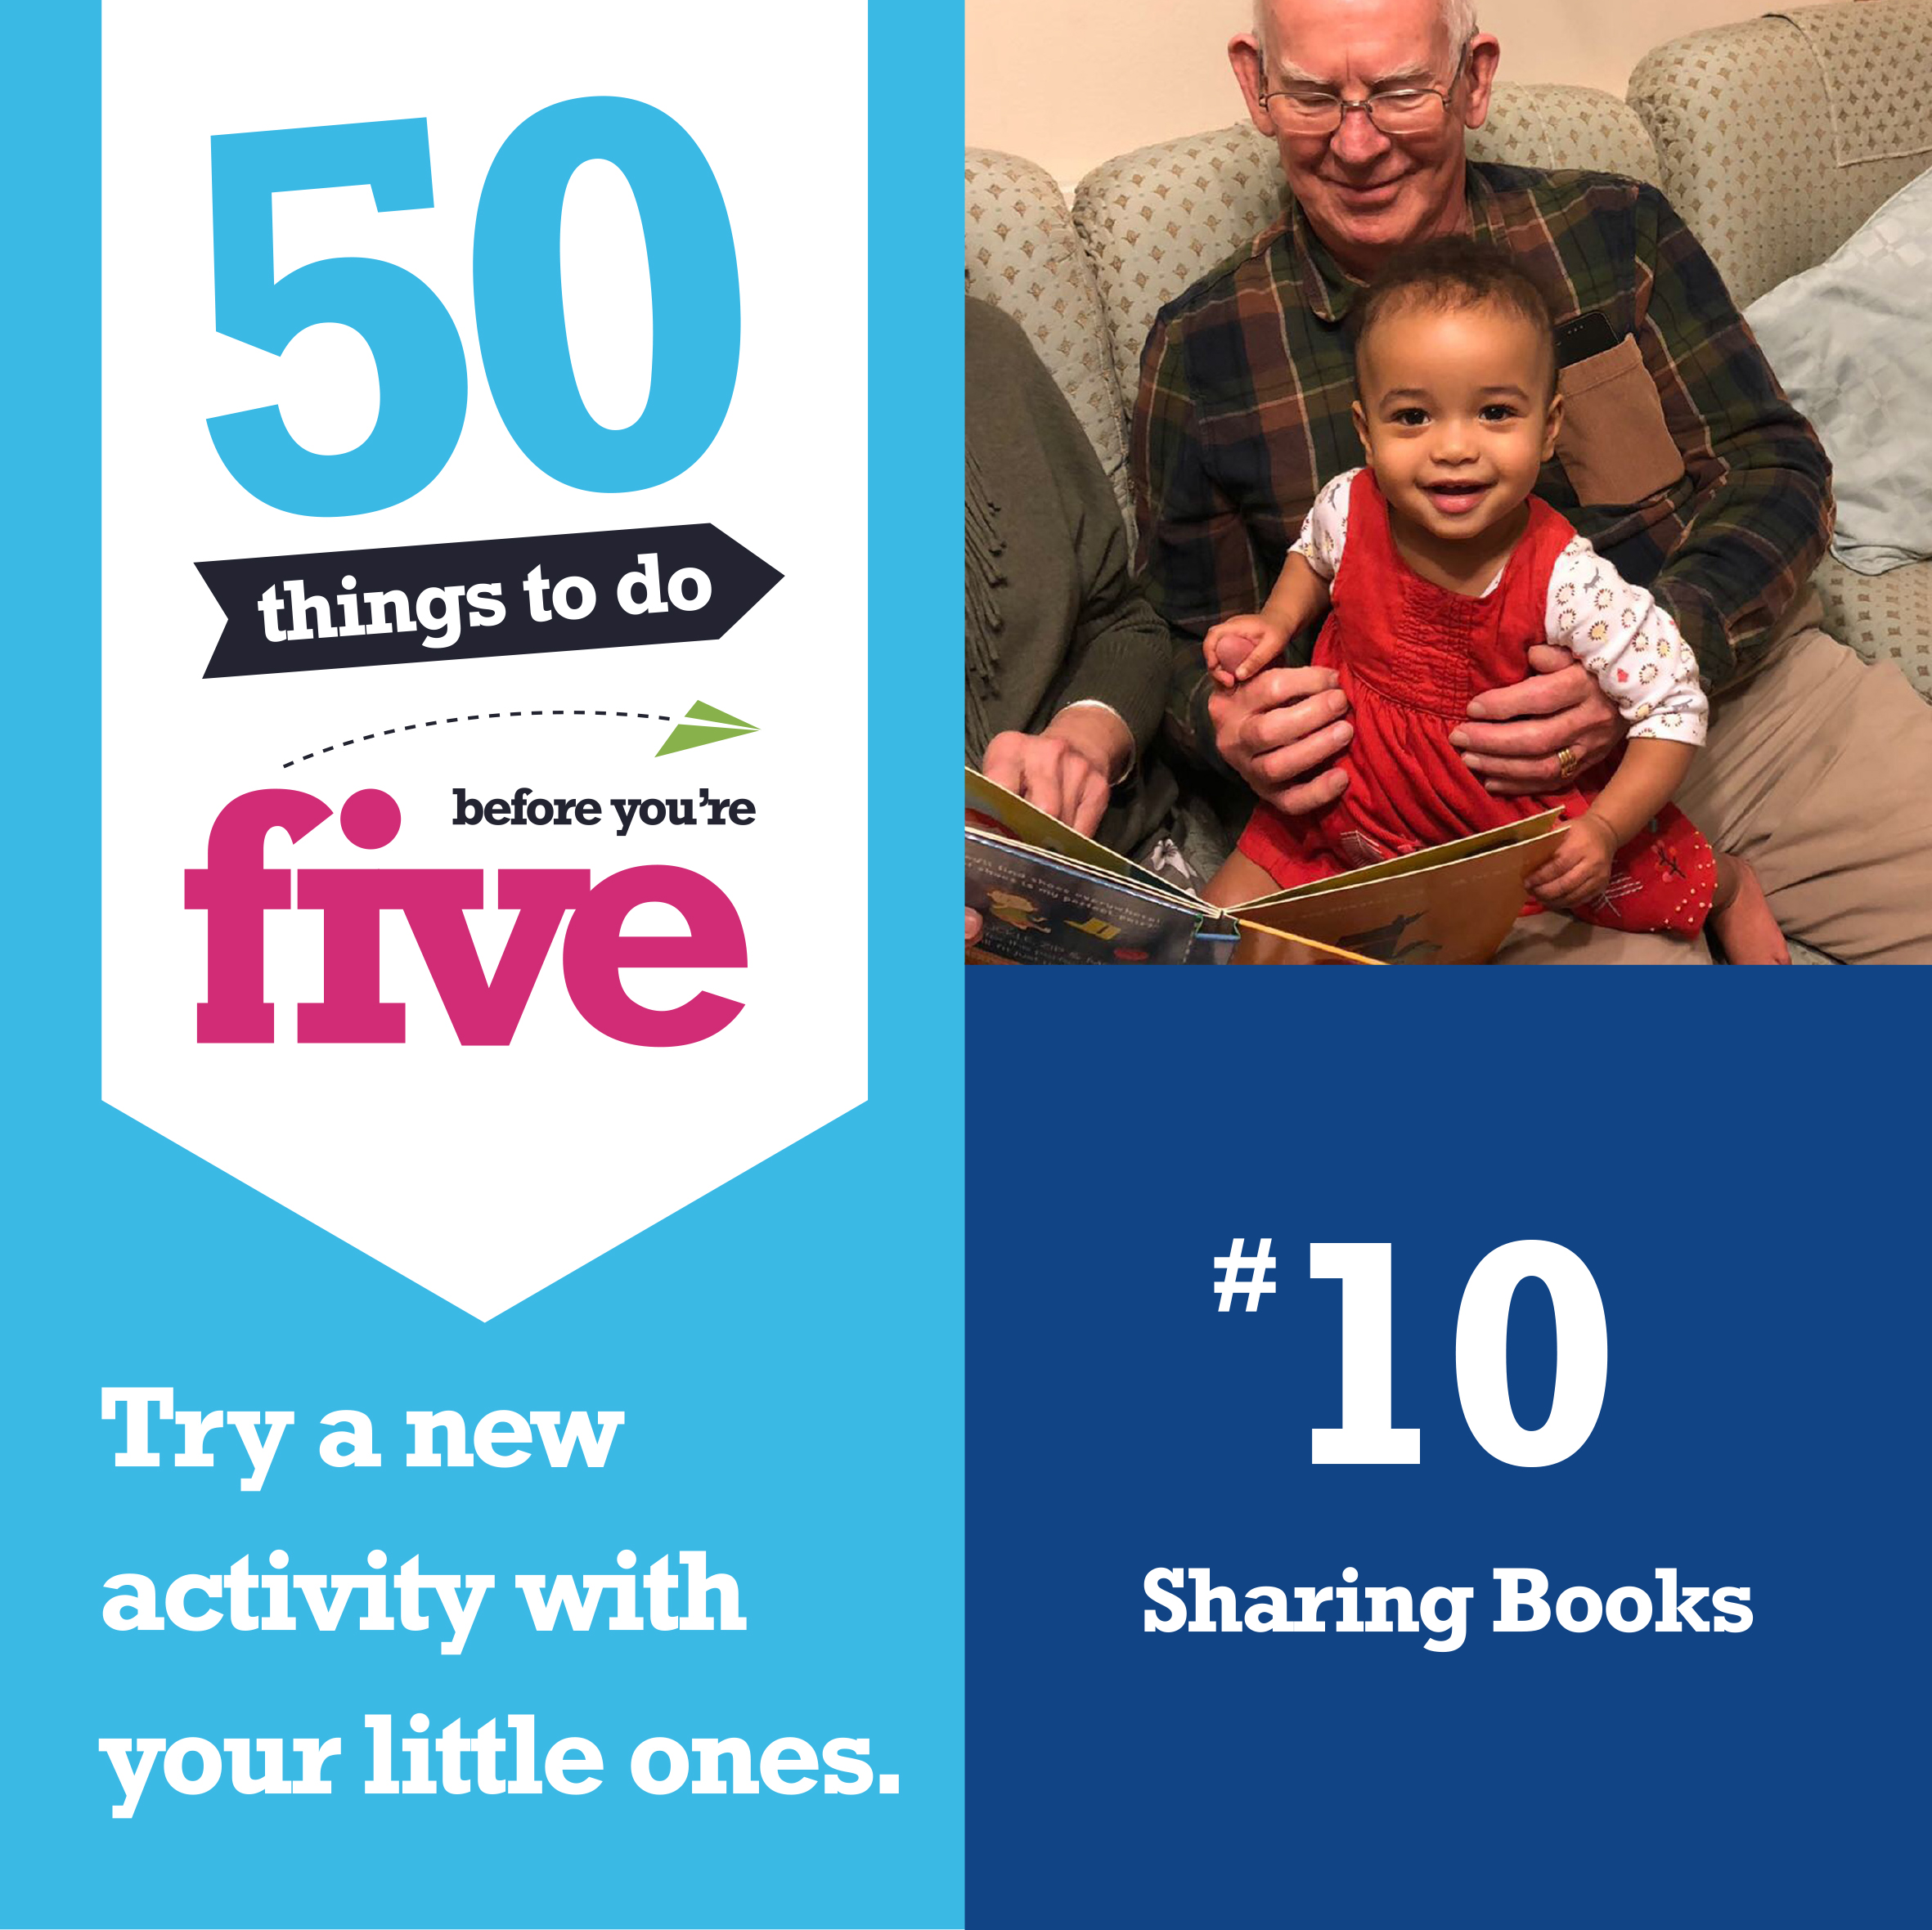 50 things image